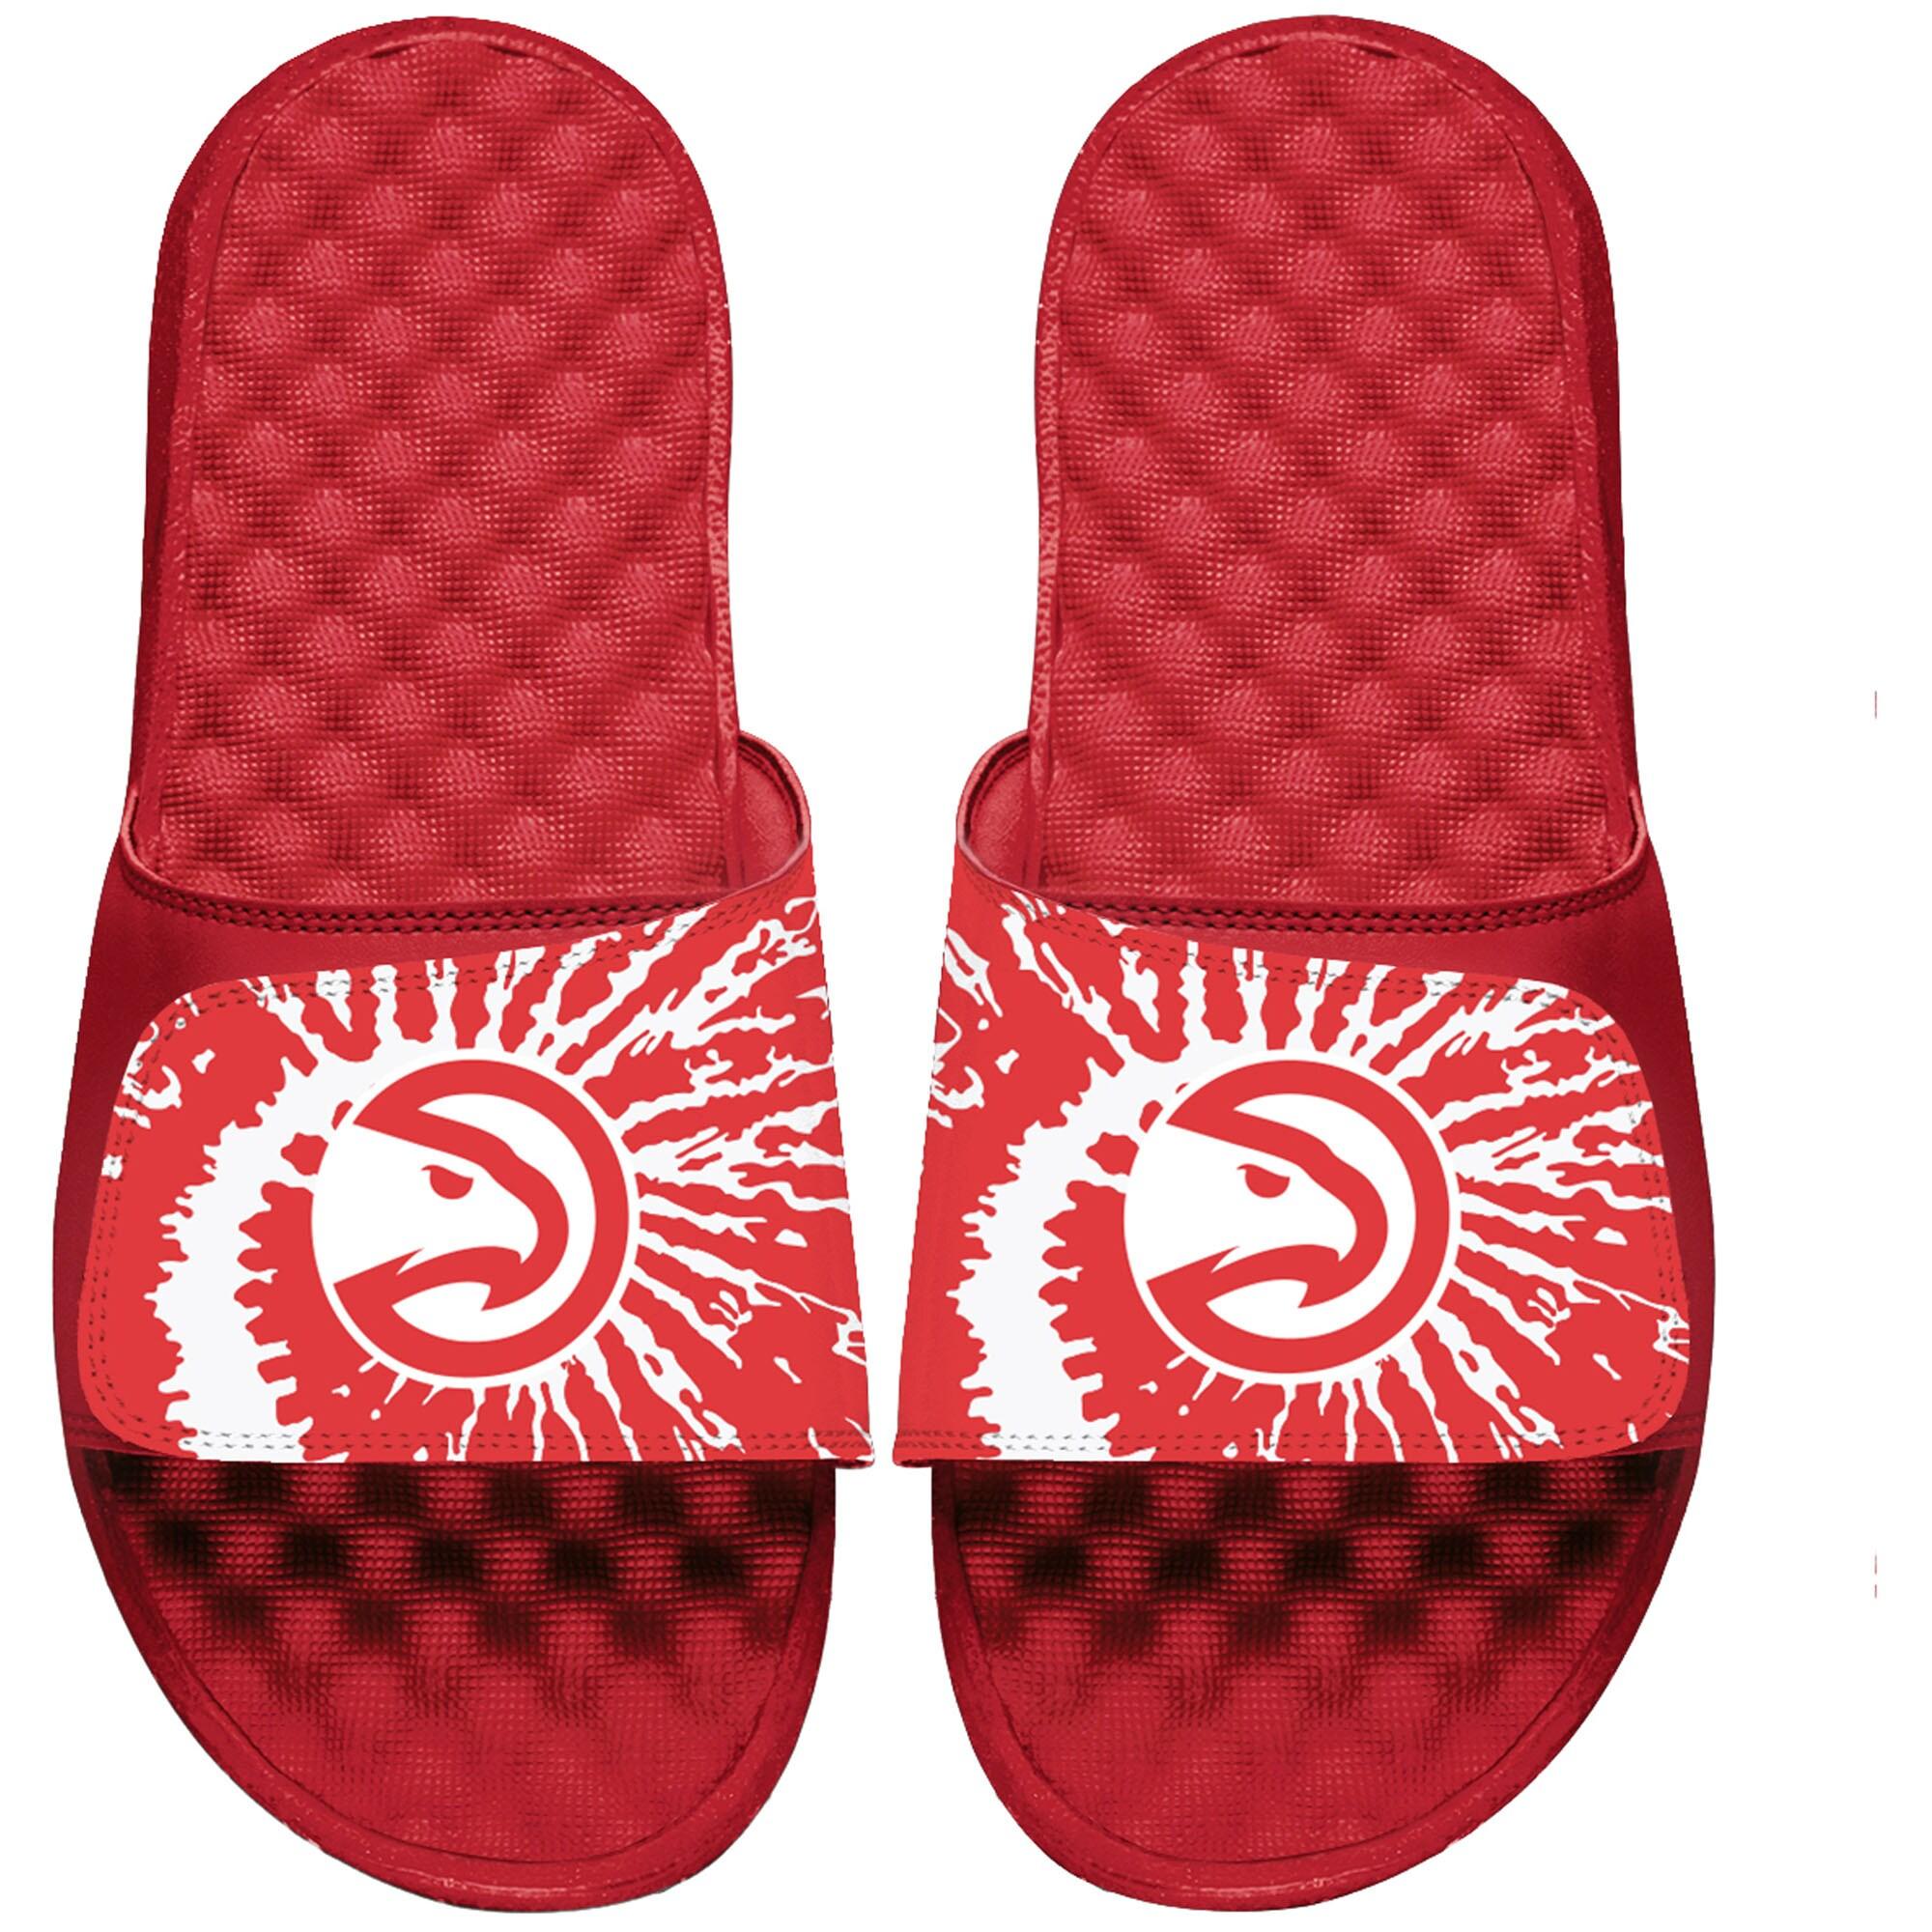 Atlanta Hawks ISlide Youth Tie Dye Slide Sandals - Red